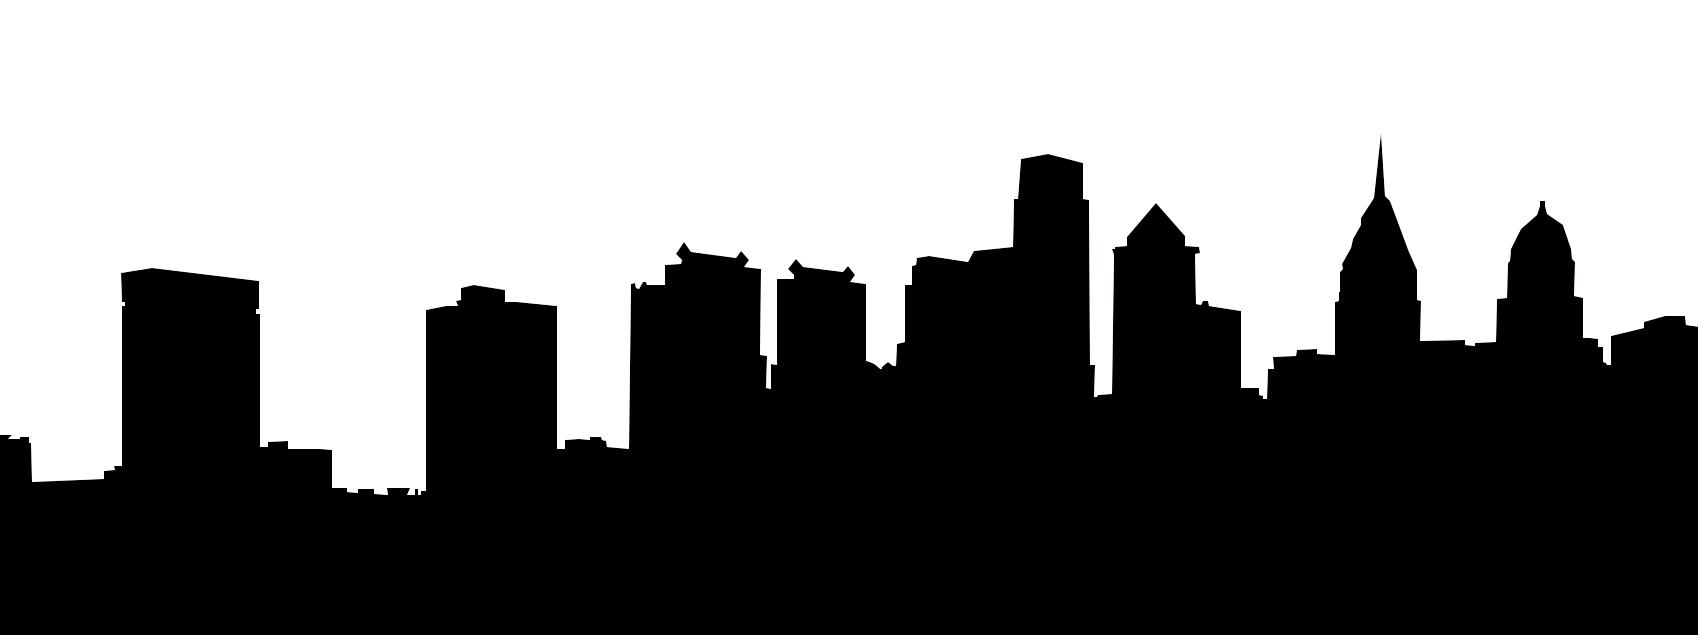 1698x635 Philly Skyline Silhouette